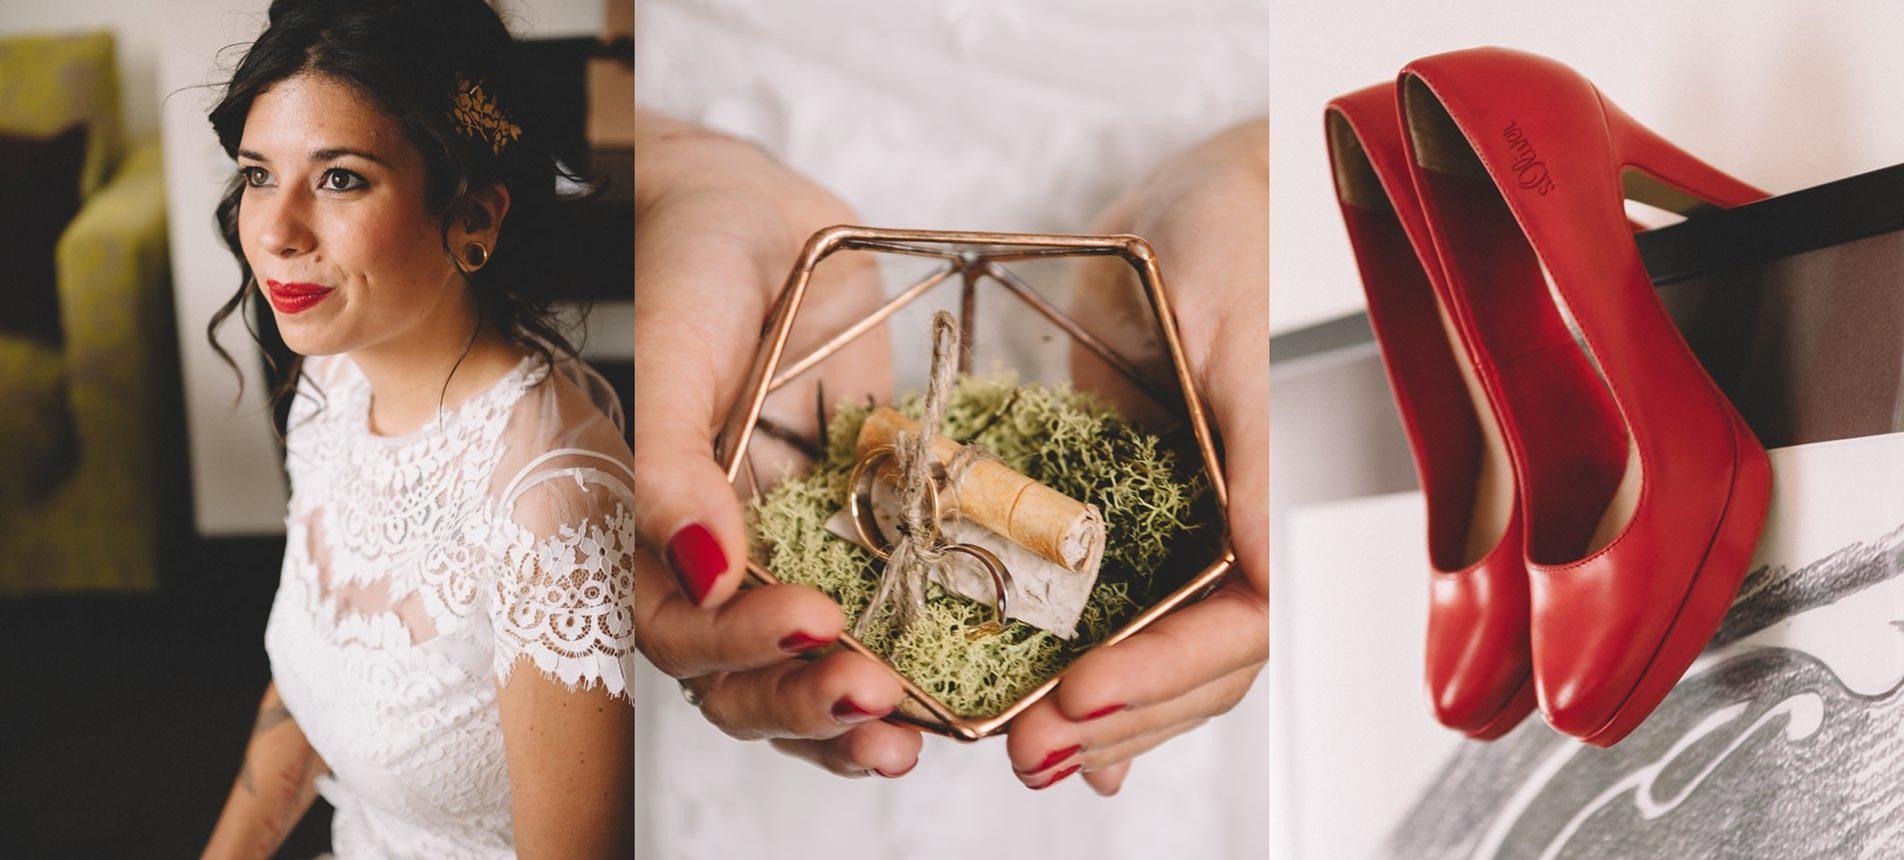 monika breitenmoser photographe mariage cercle des bains geneve